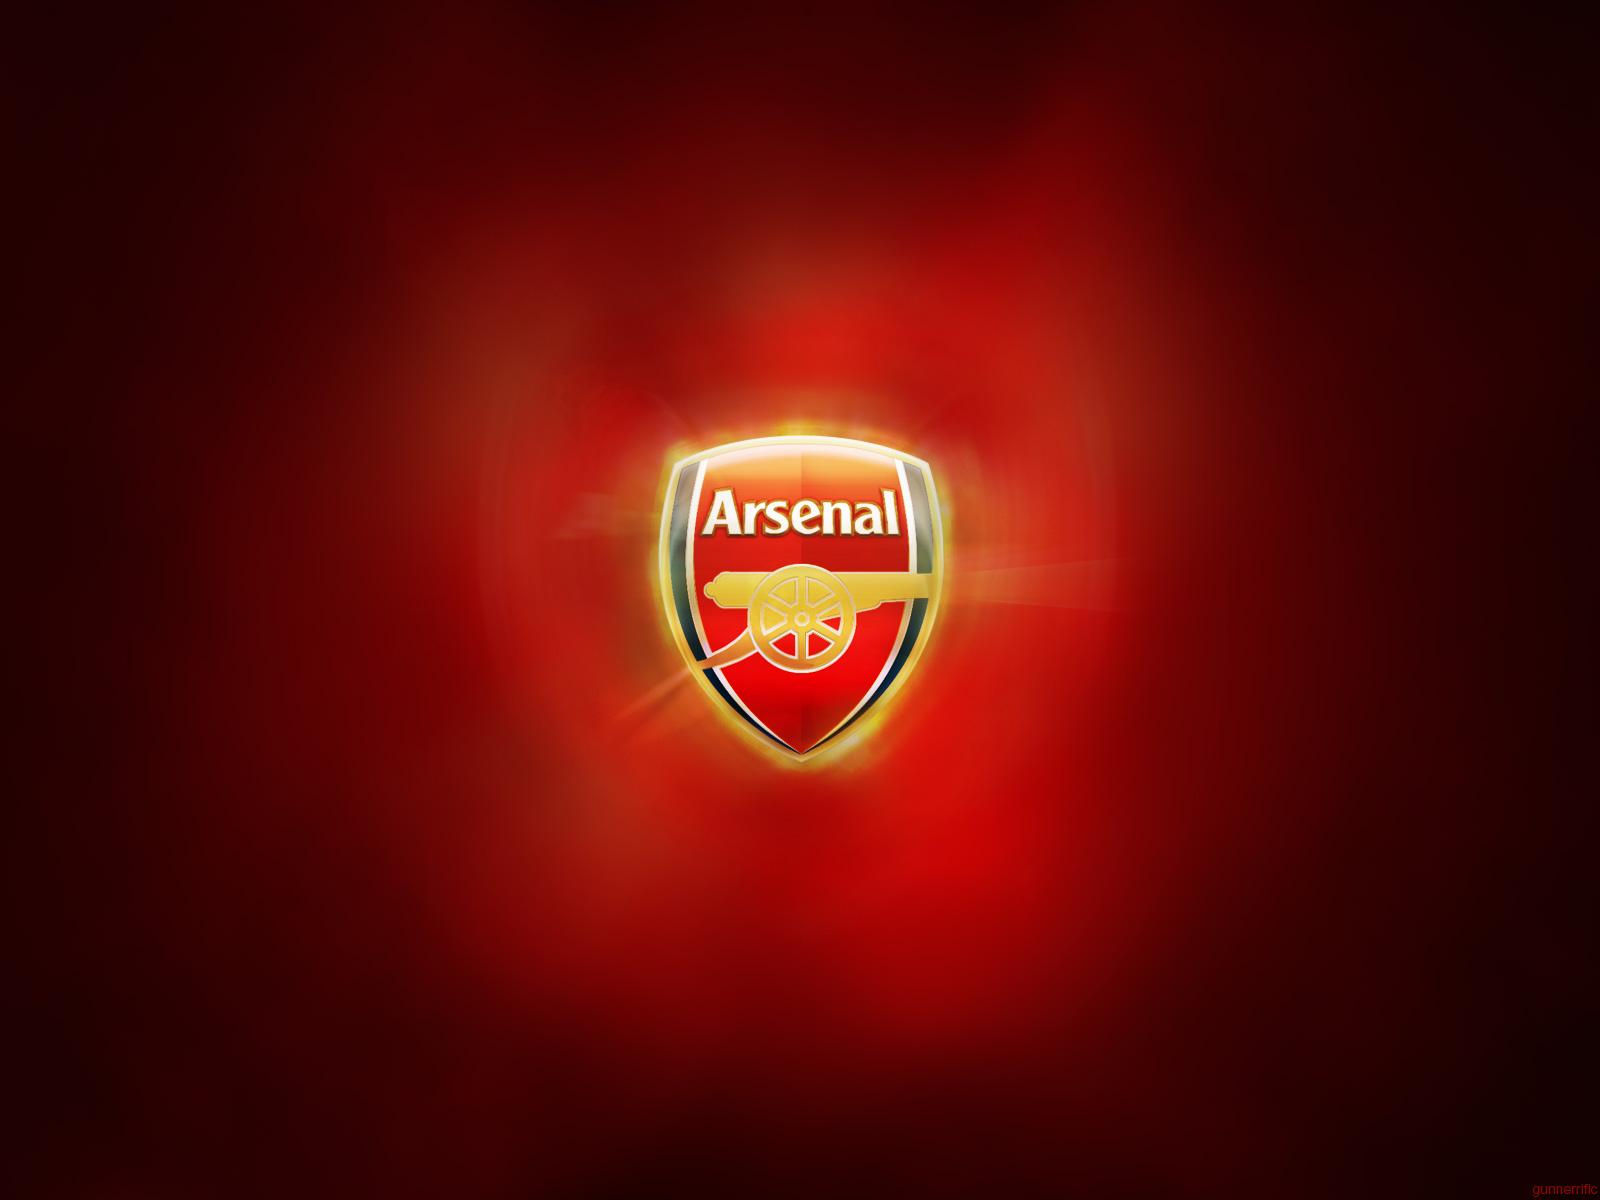 arsenal   Arsenal Wallpaper 123493 1600x1200